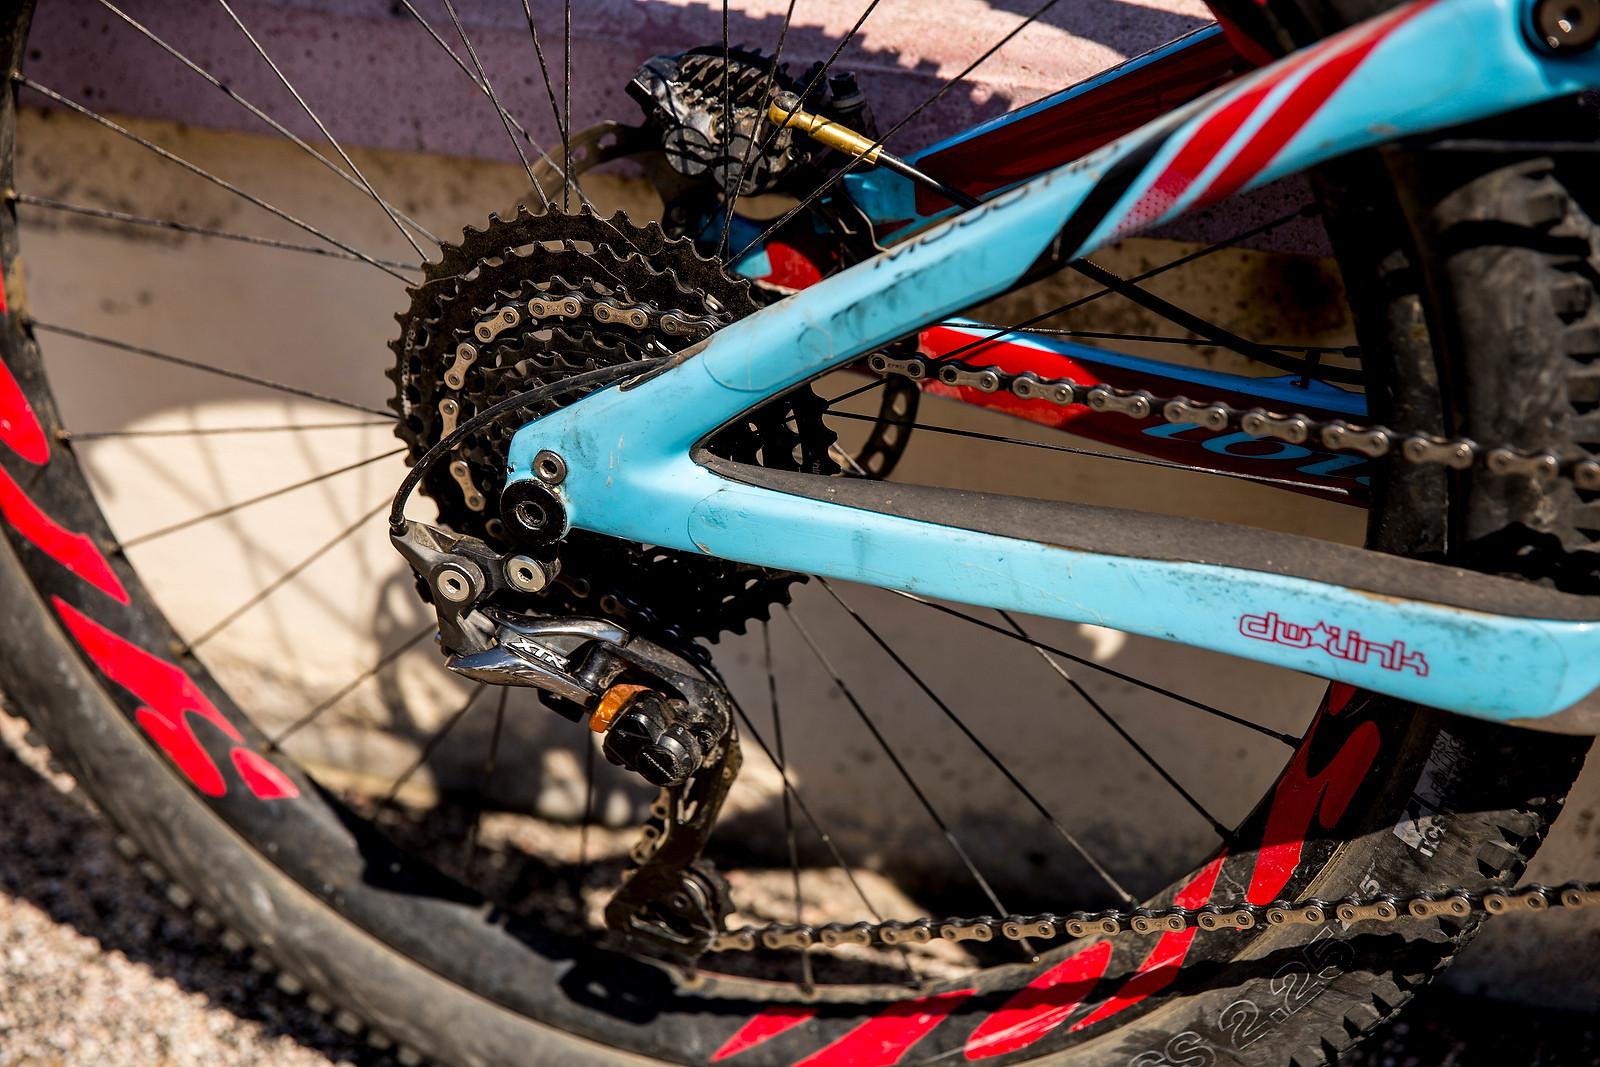 Shimano XTR Rear Derailleur, e*thirteen TRS+ Cassette - WINNING BIKE: Anita Gehrig's Ibis Mojo HD3 - Mountain Biking Pictures - Vital MTB